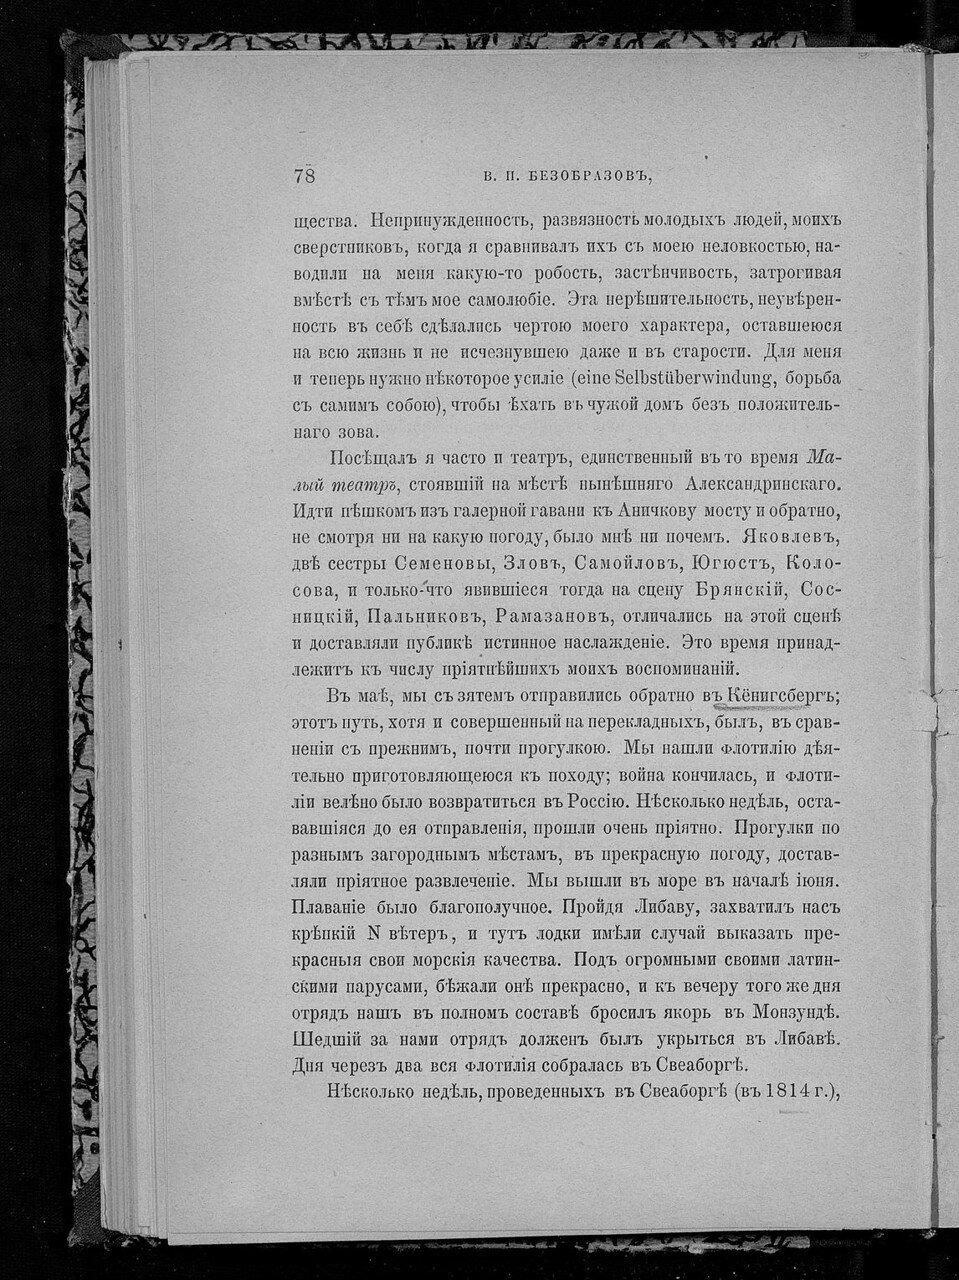 https://img-fotki.yandex.ru/get/875526/199368979.d4/0_21dded_c033cb26_XXXL.jpg